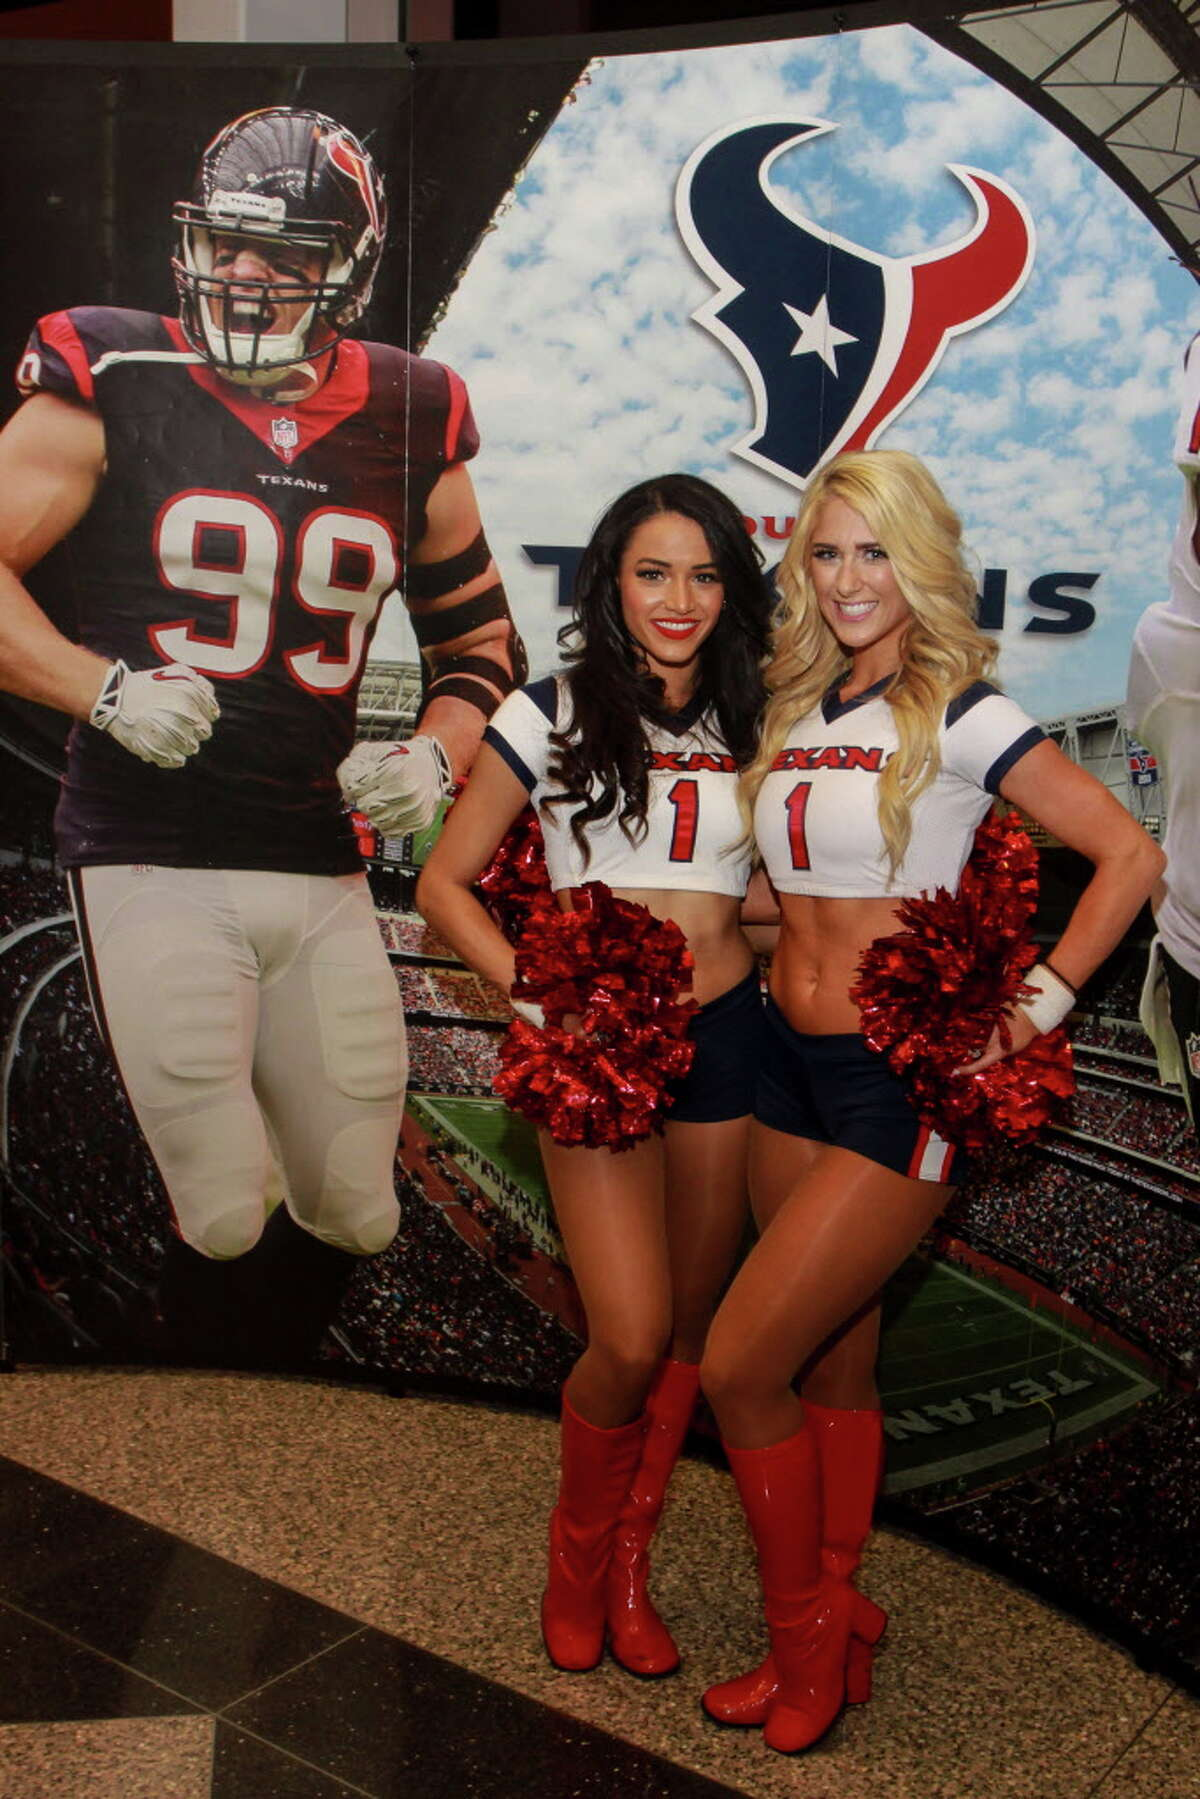 Texan cheerleaders Angelina, left, and Brittrini, at the Taste of the Texans.